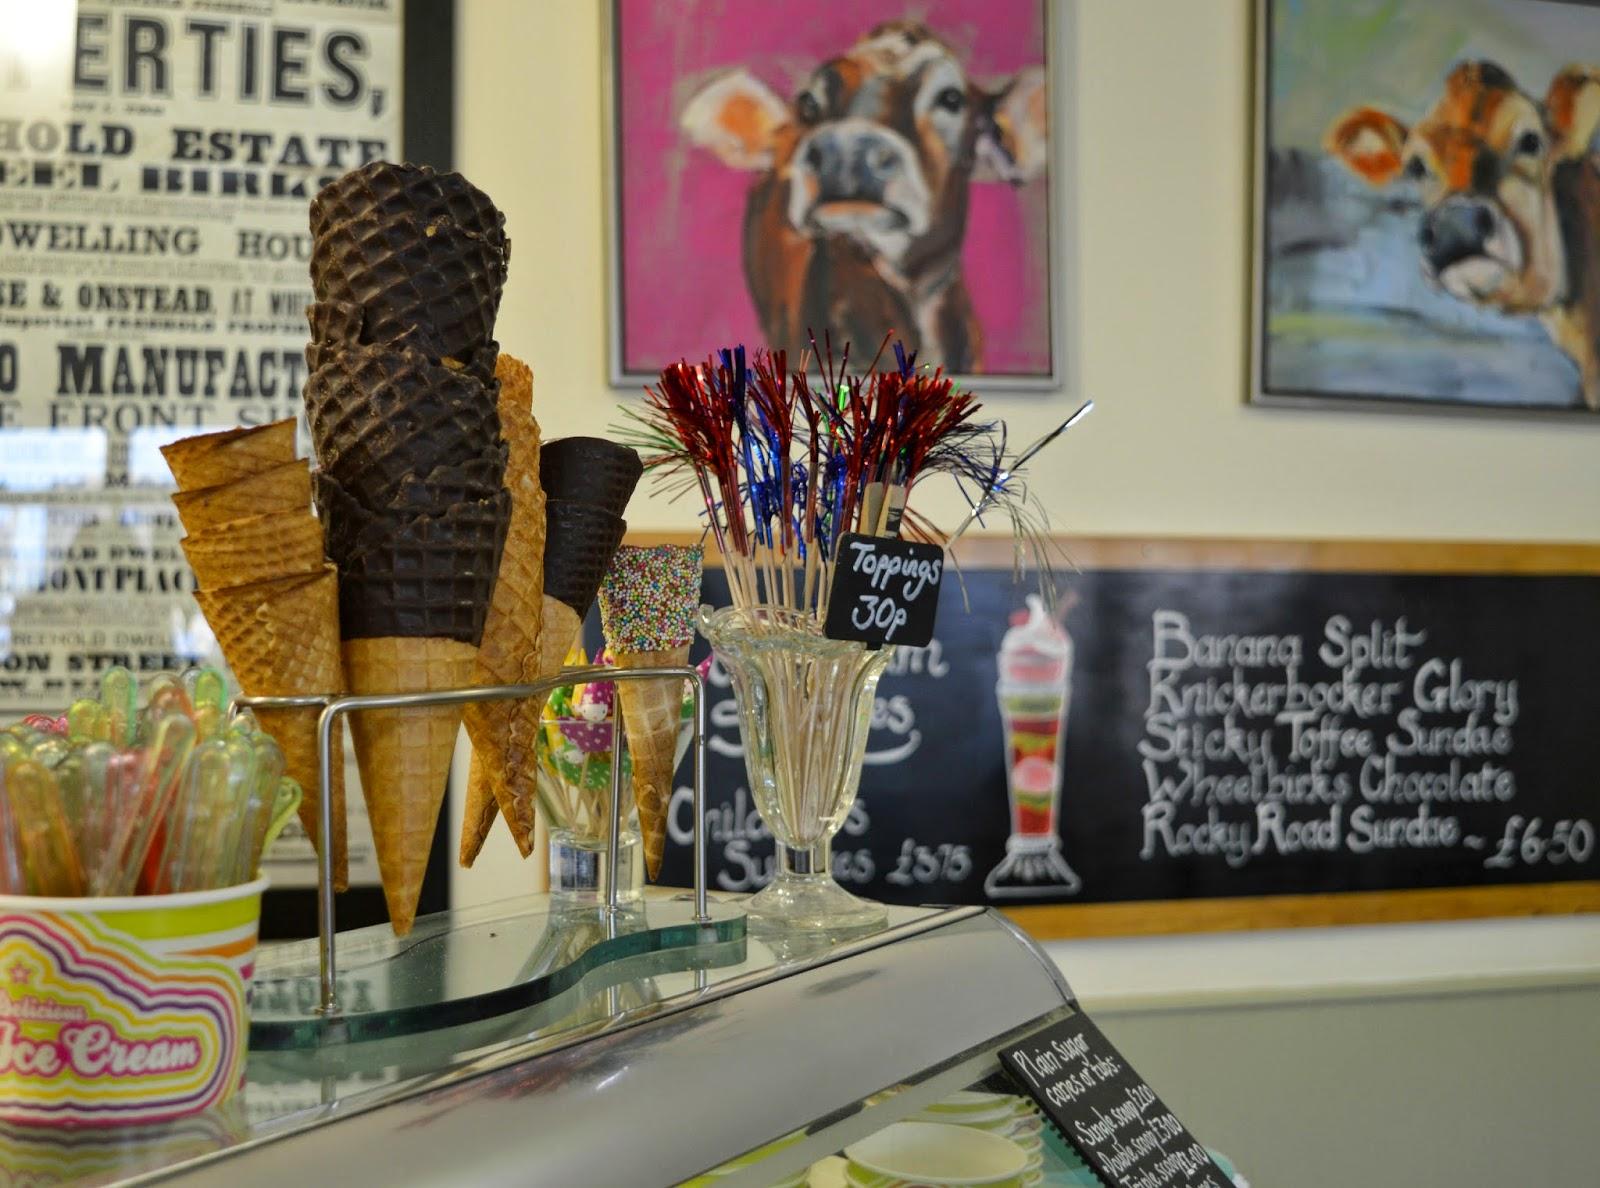 North East Ice Cream Parlours - Wheelbirks Stocksfield